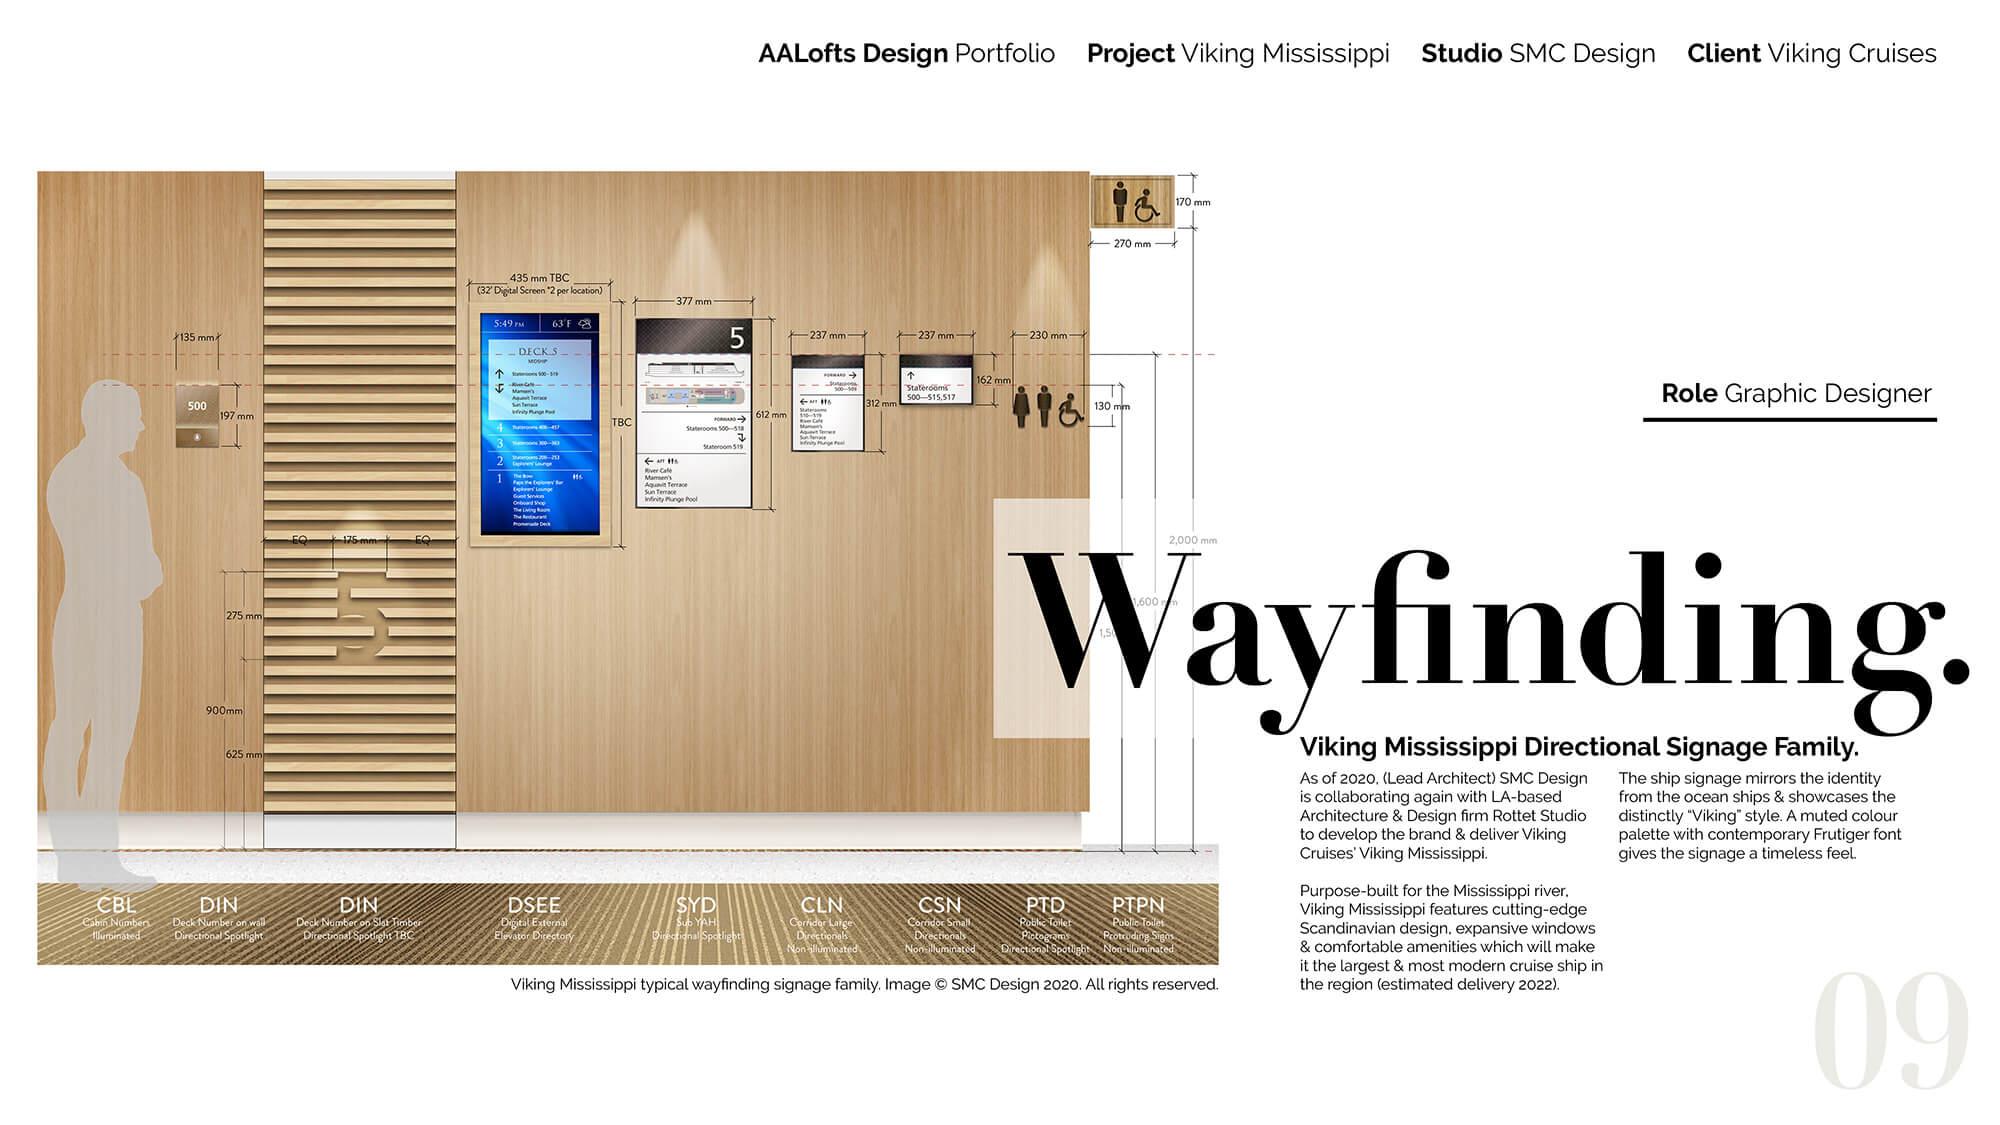 2021_AALOFTS DESIGN PORTFOLIO_Page_09